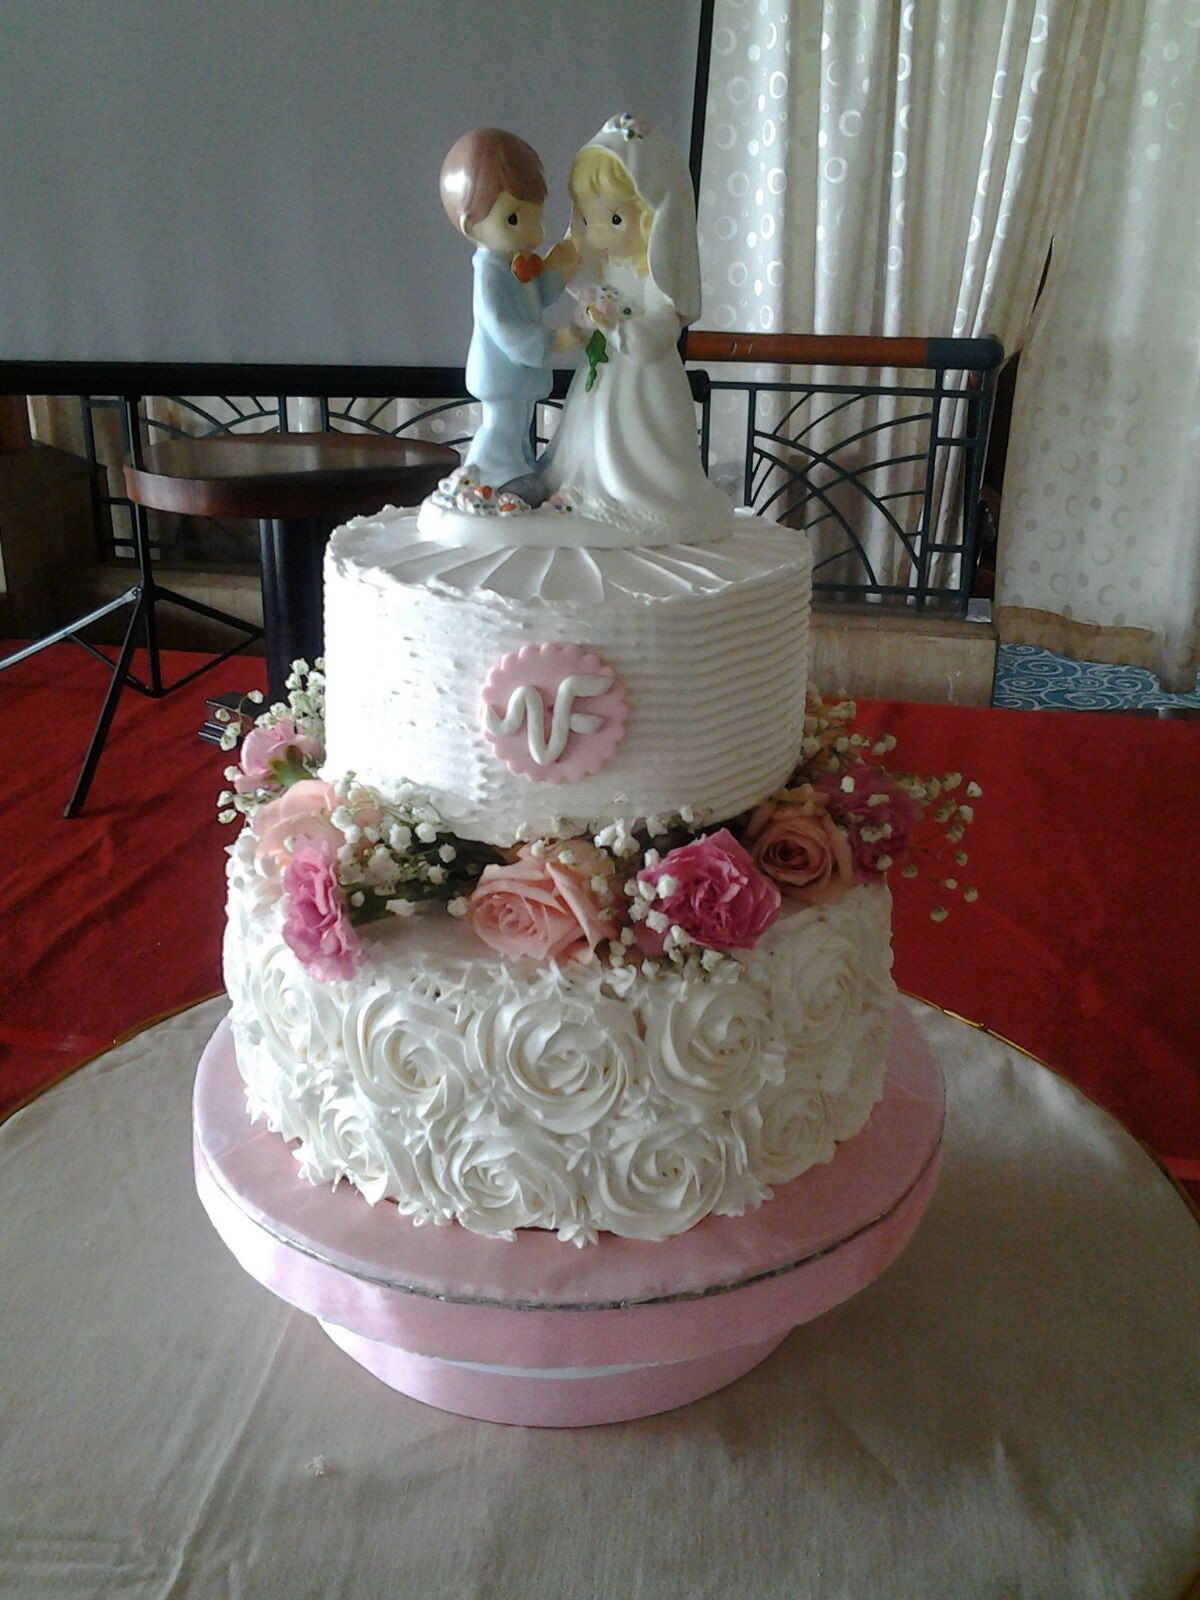 Wedding Cakes On Line  KLAPPERTAART ONLINE Wedding Cake By Klappertaart line